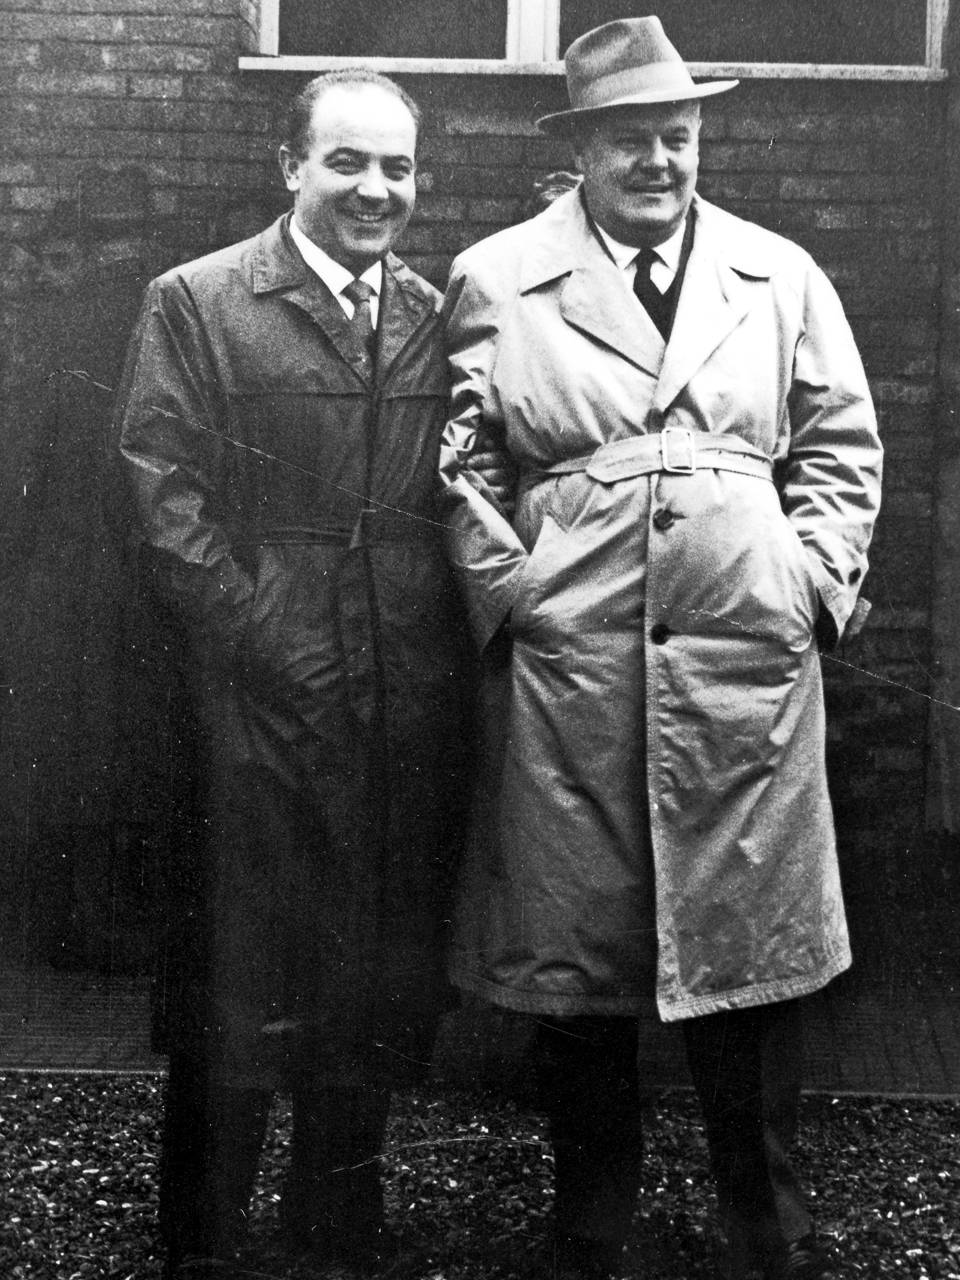 Gino Lari insieme a Giannetto Cimurri Fototeca Biblioteca Panizzi, Reggio Emilia 1963